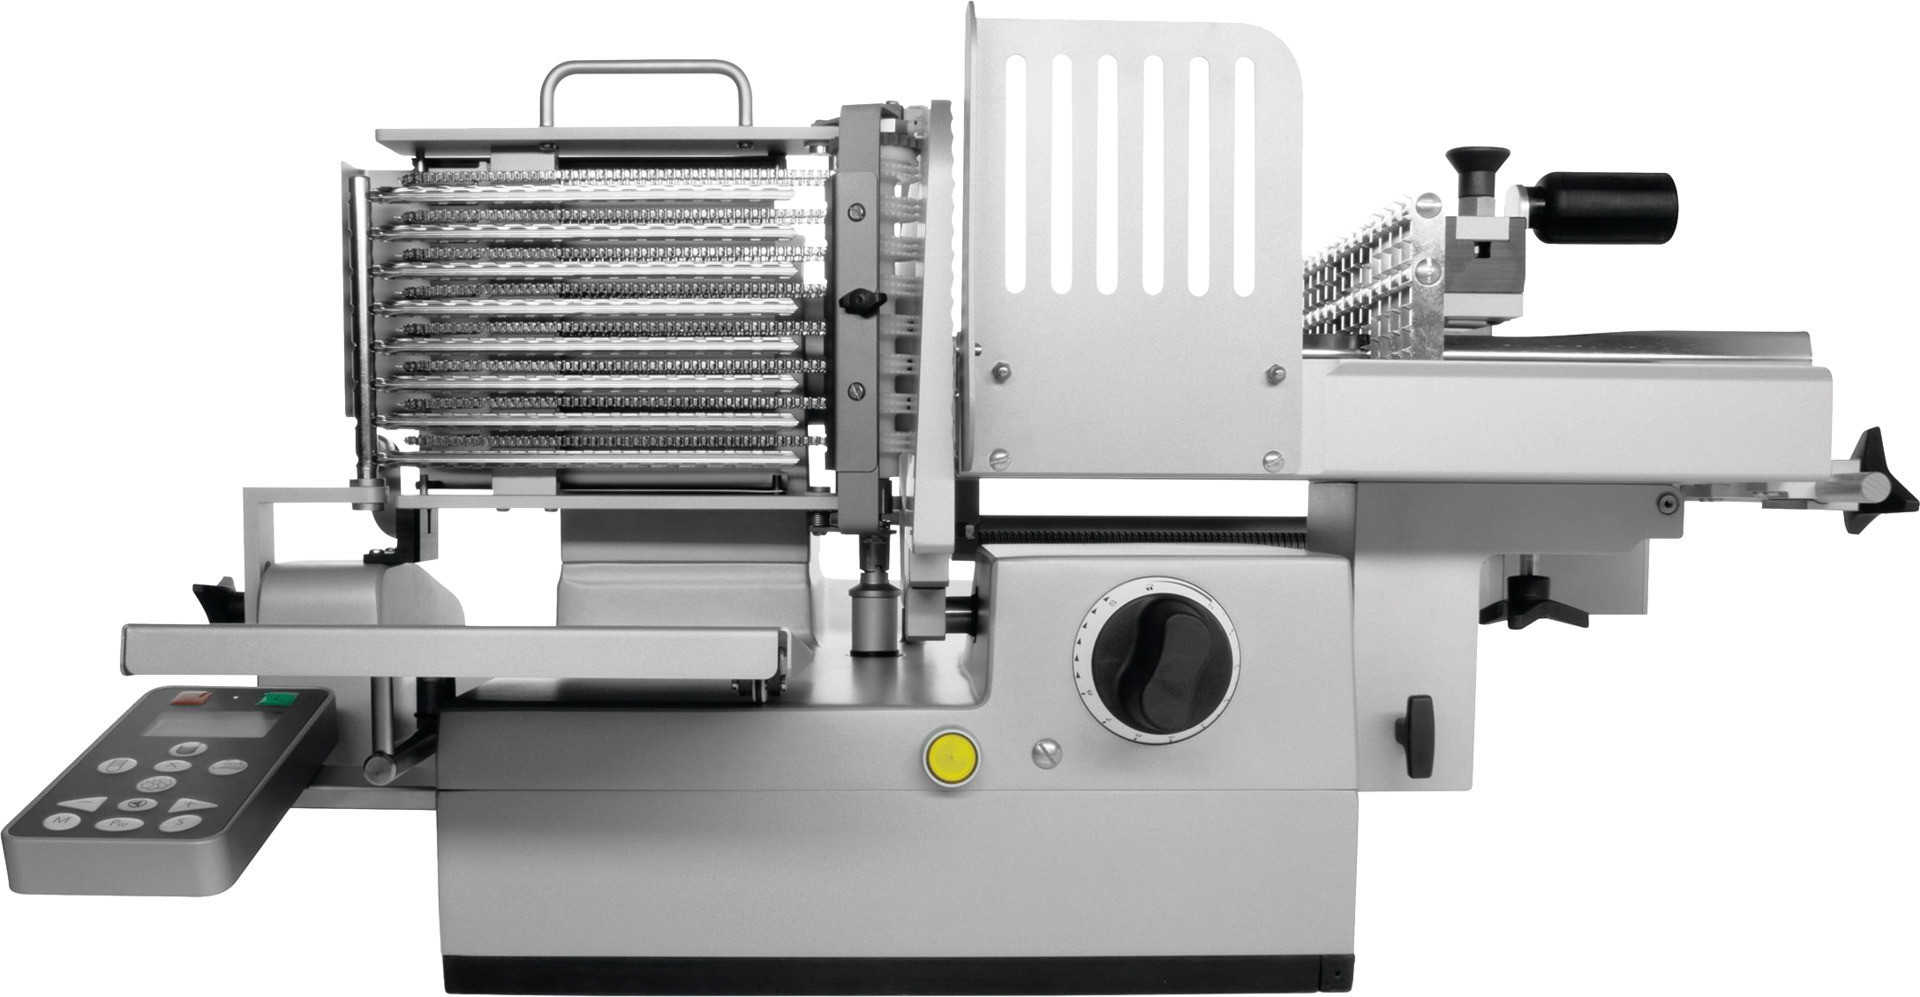 Vollautomatische Aufschnittmaschine ø 300 mm / 230 V / VA802 ...